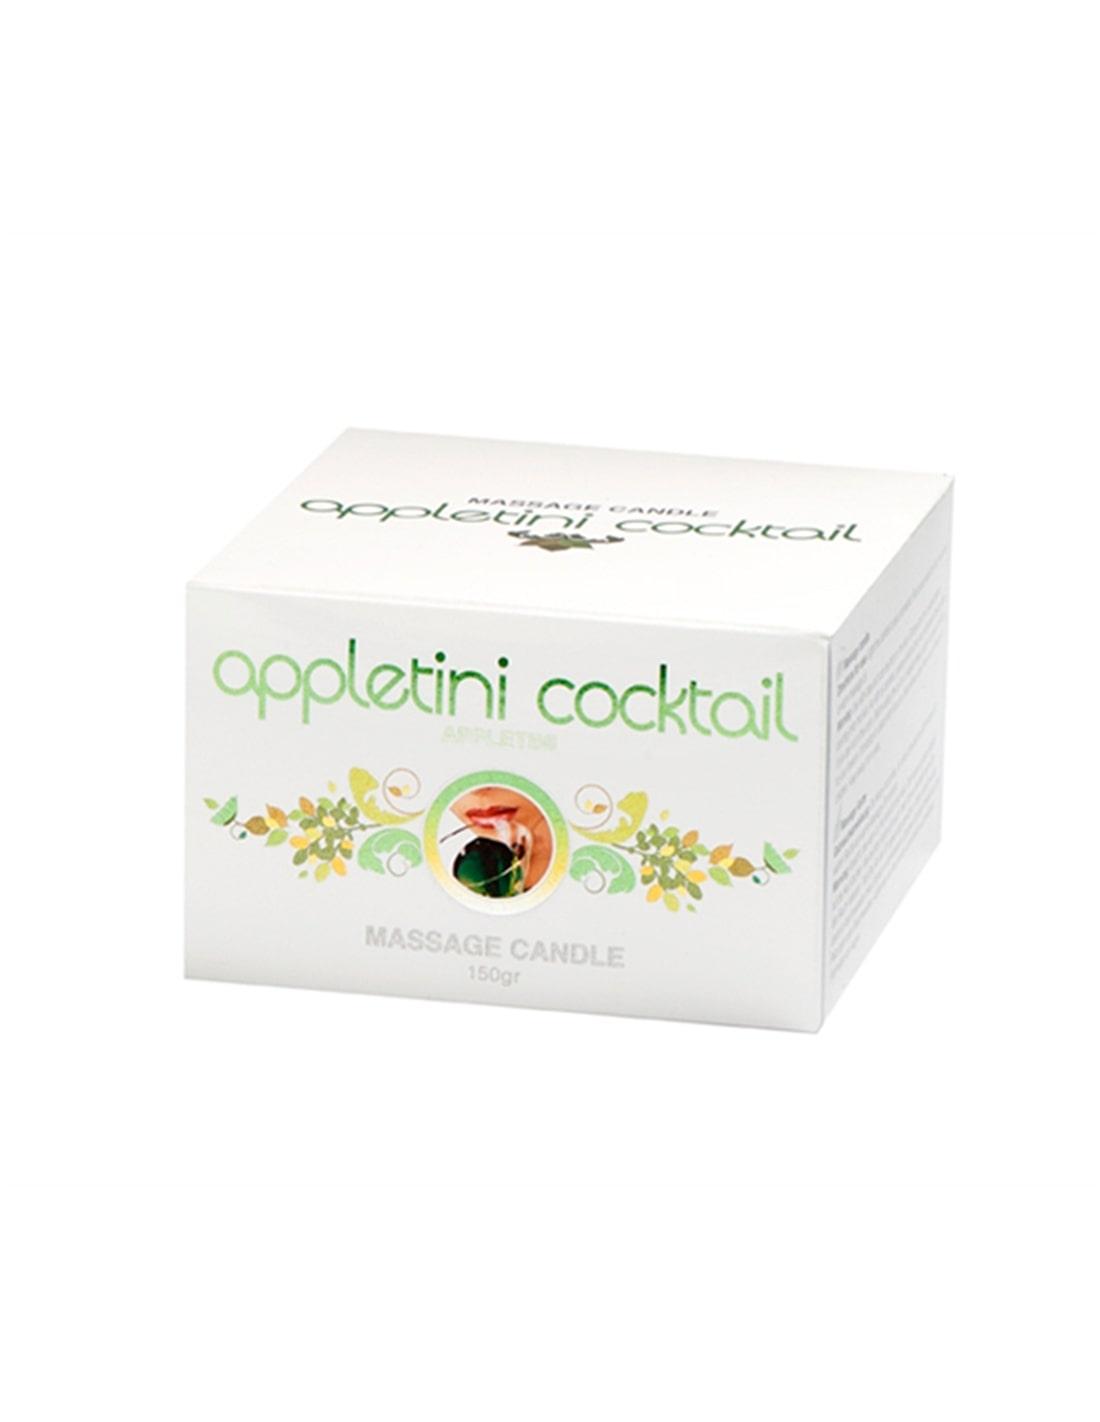 Vela de Massagem Appletini Cocktail 150Gr - PR2010320152